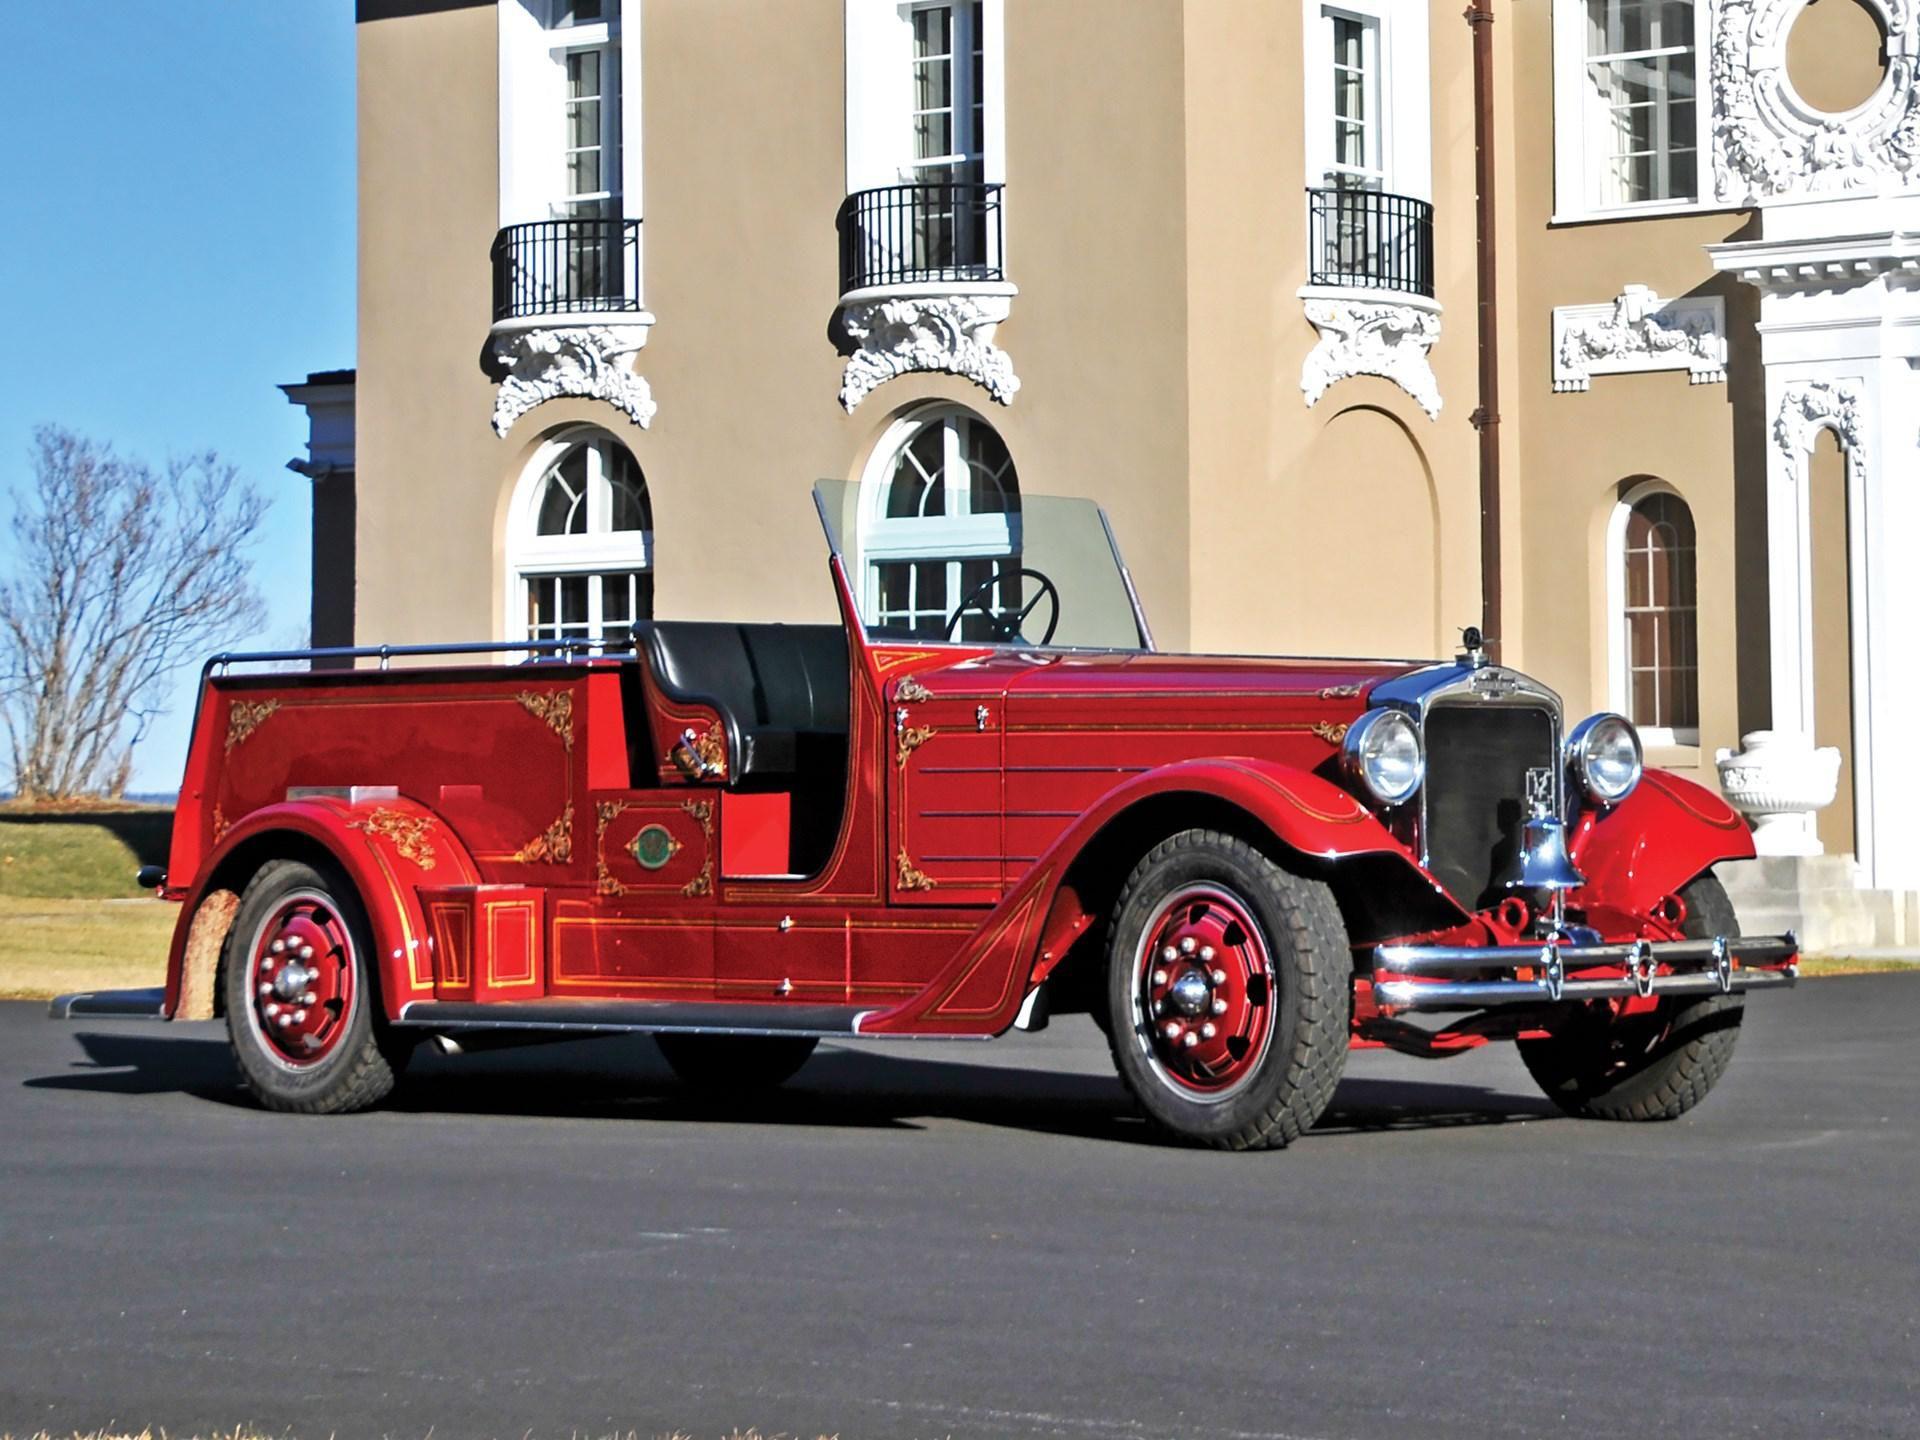 1936 American Lafrance 'Senior' 400 Series Squad Truck